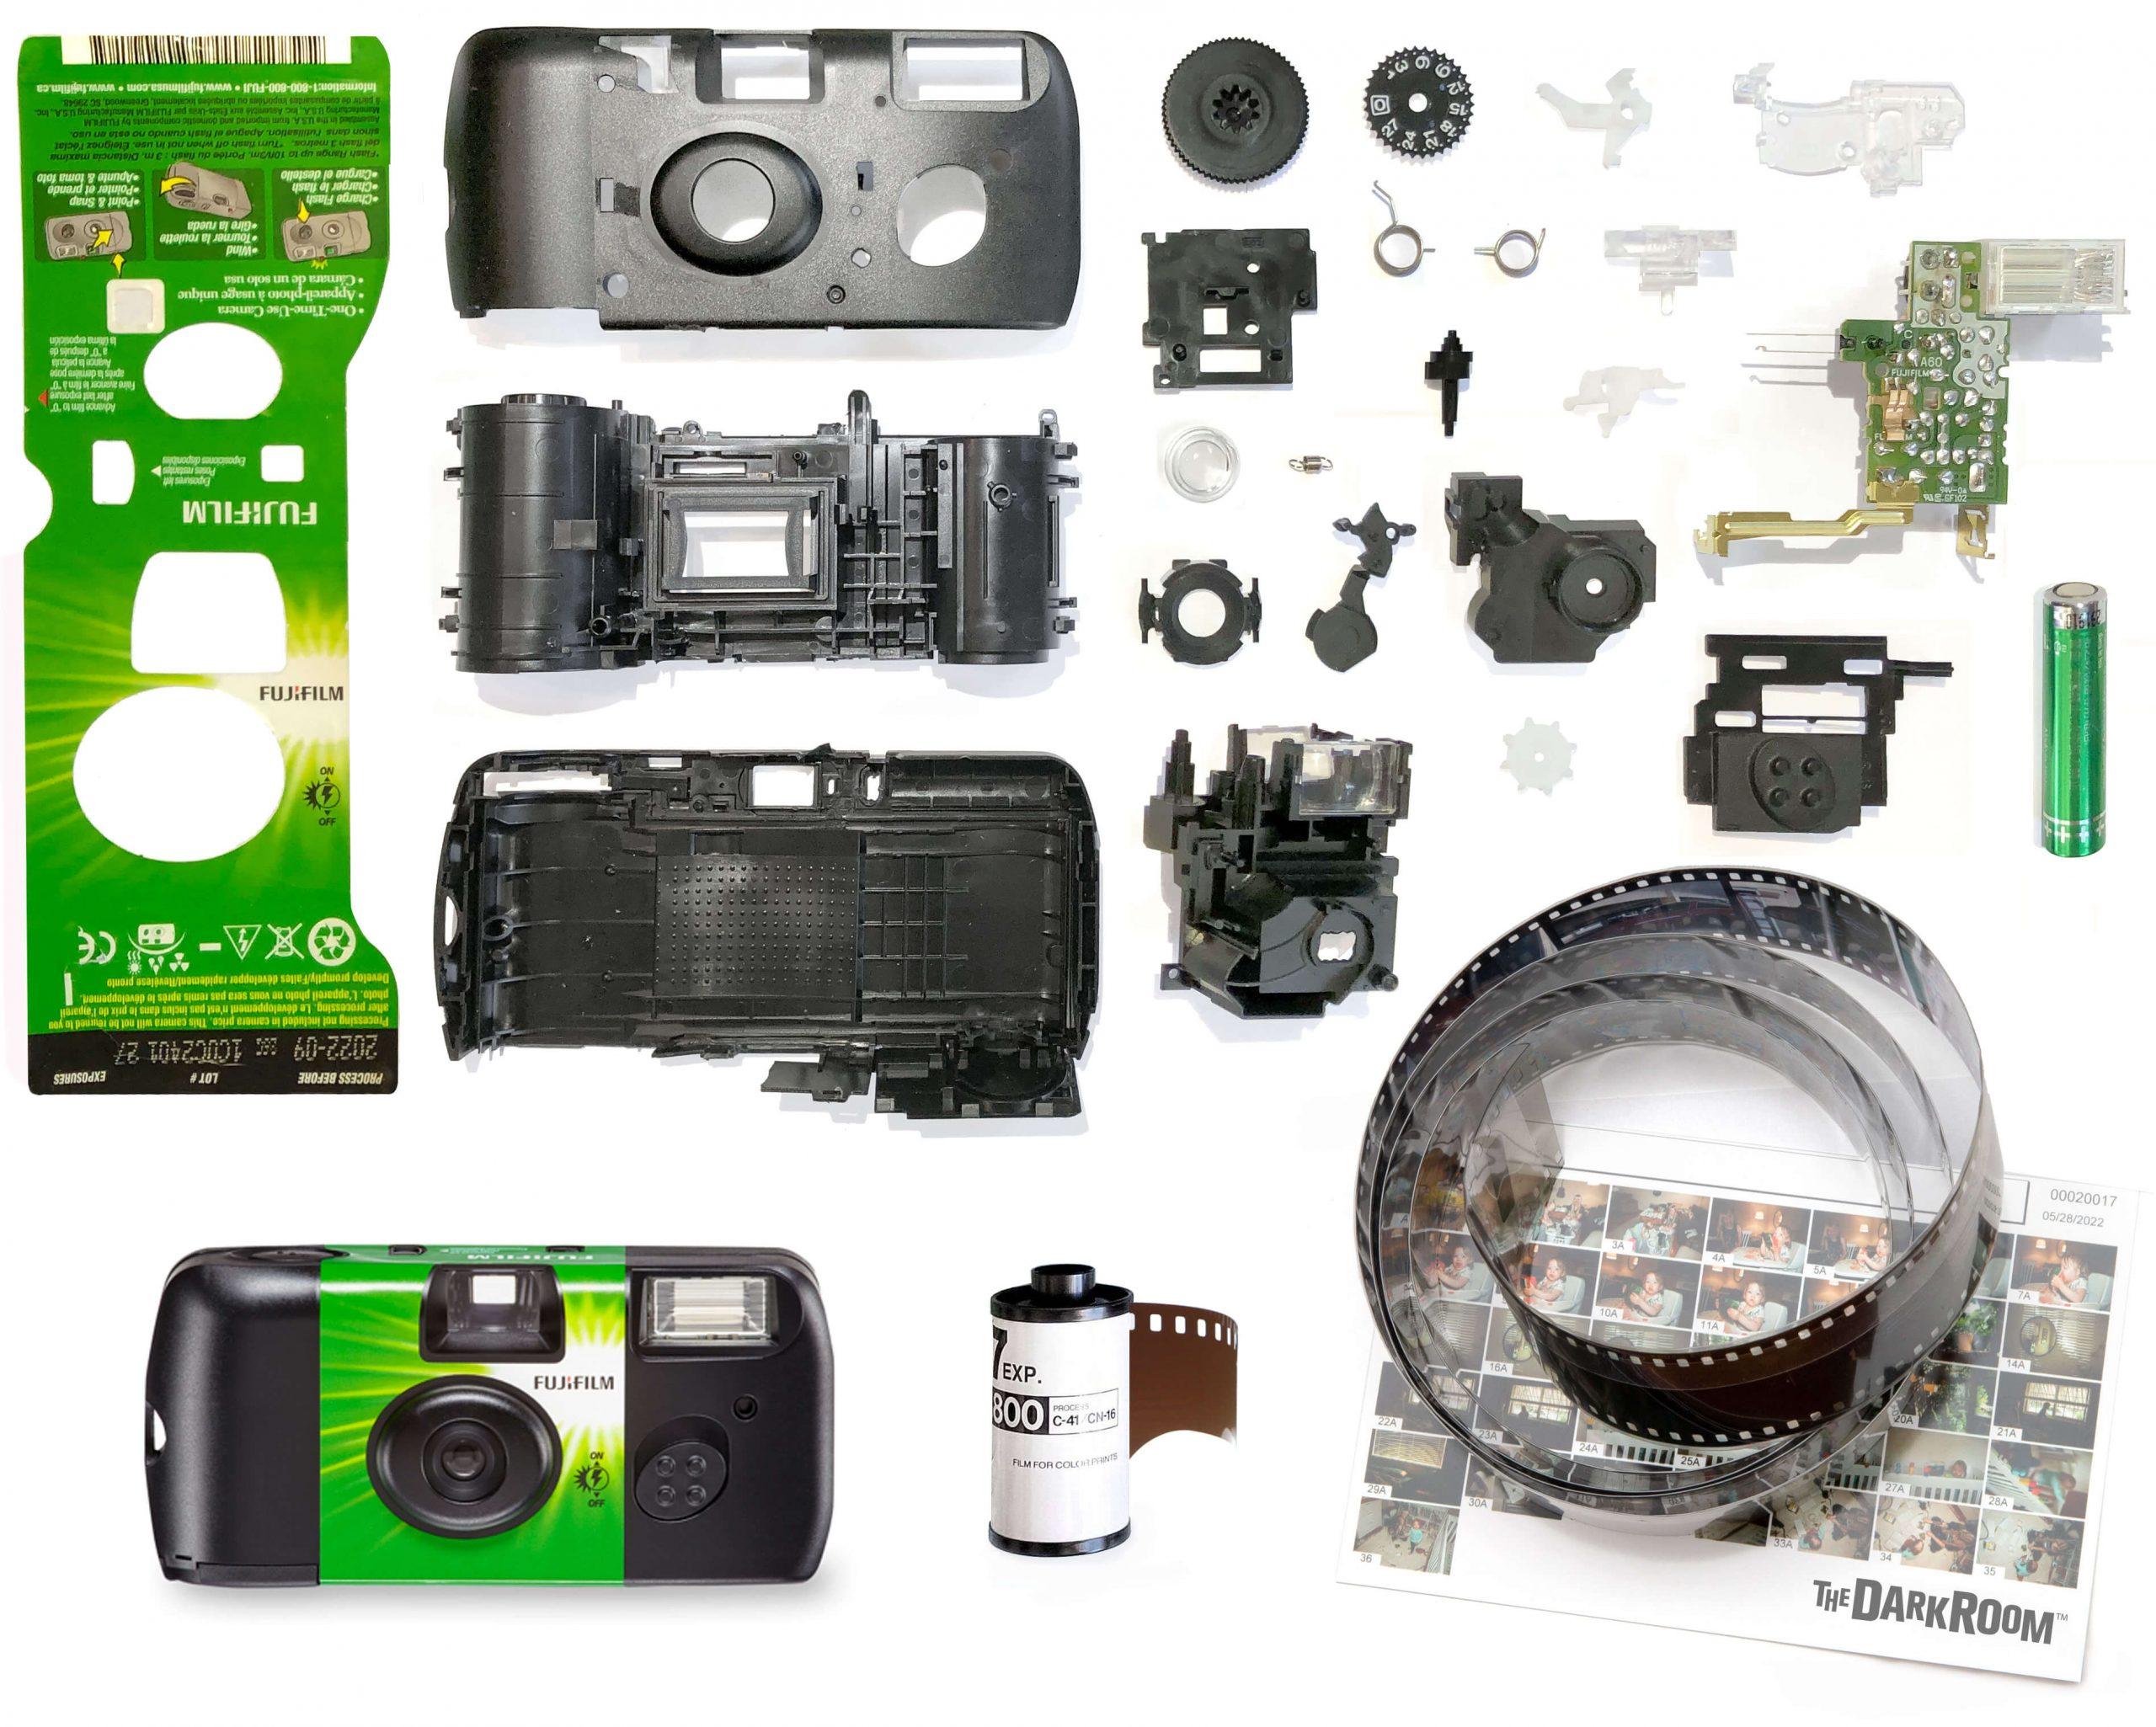 Fujifilm Quick Snap disposable camera exploded